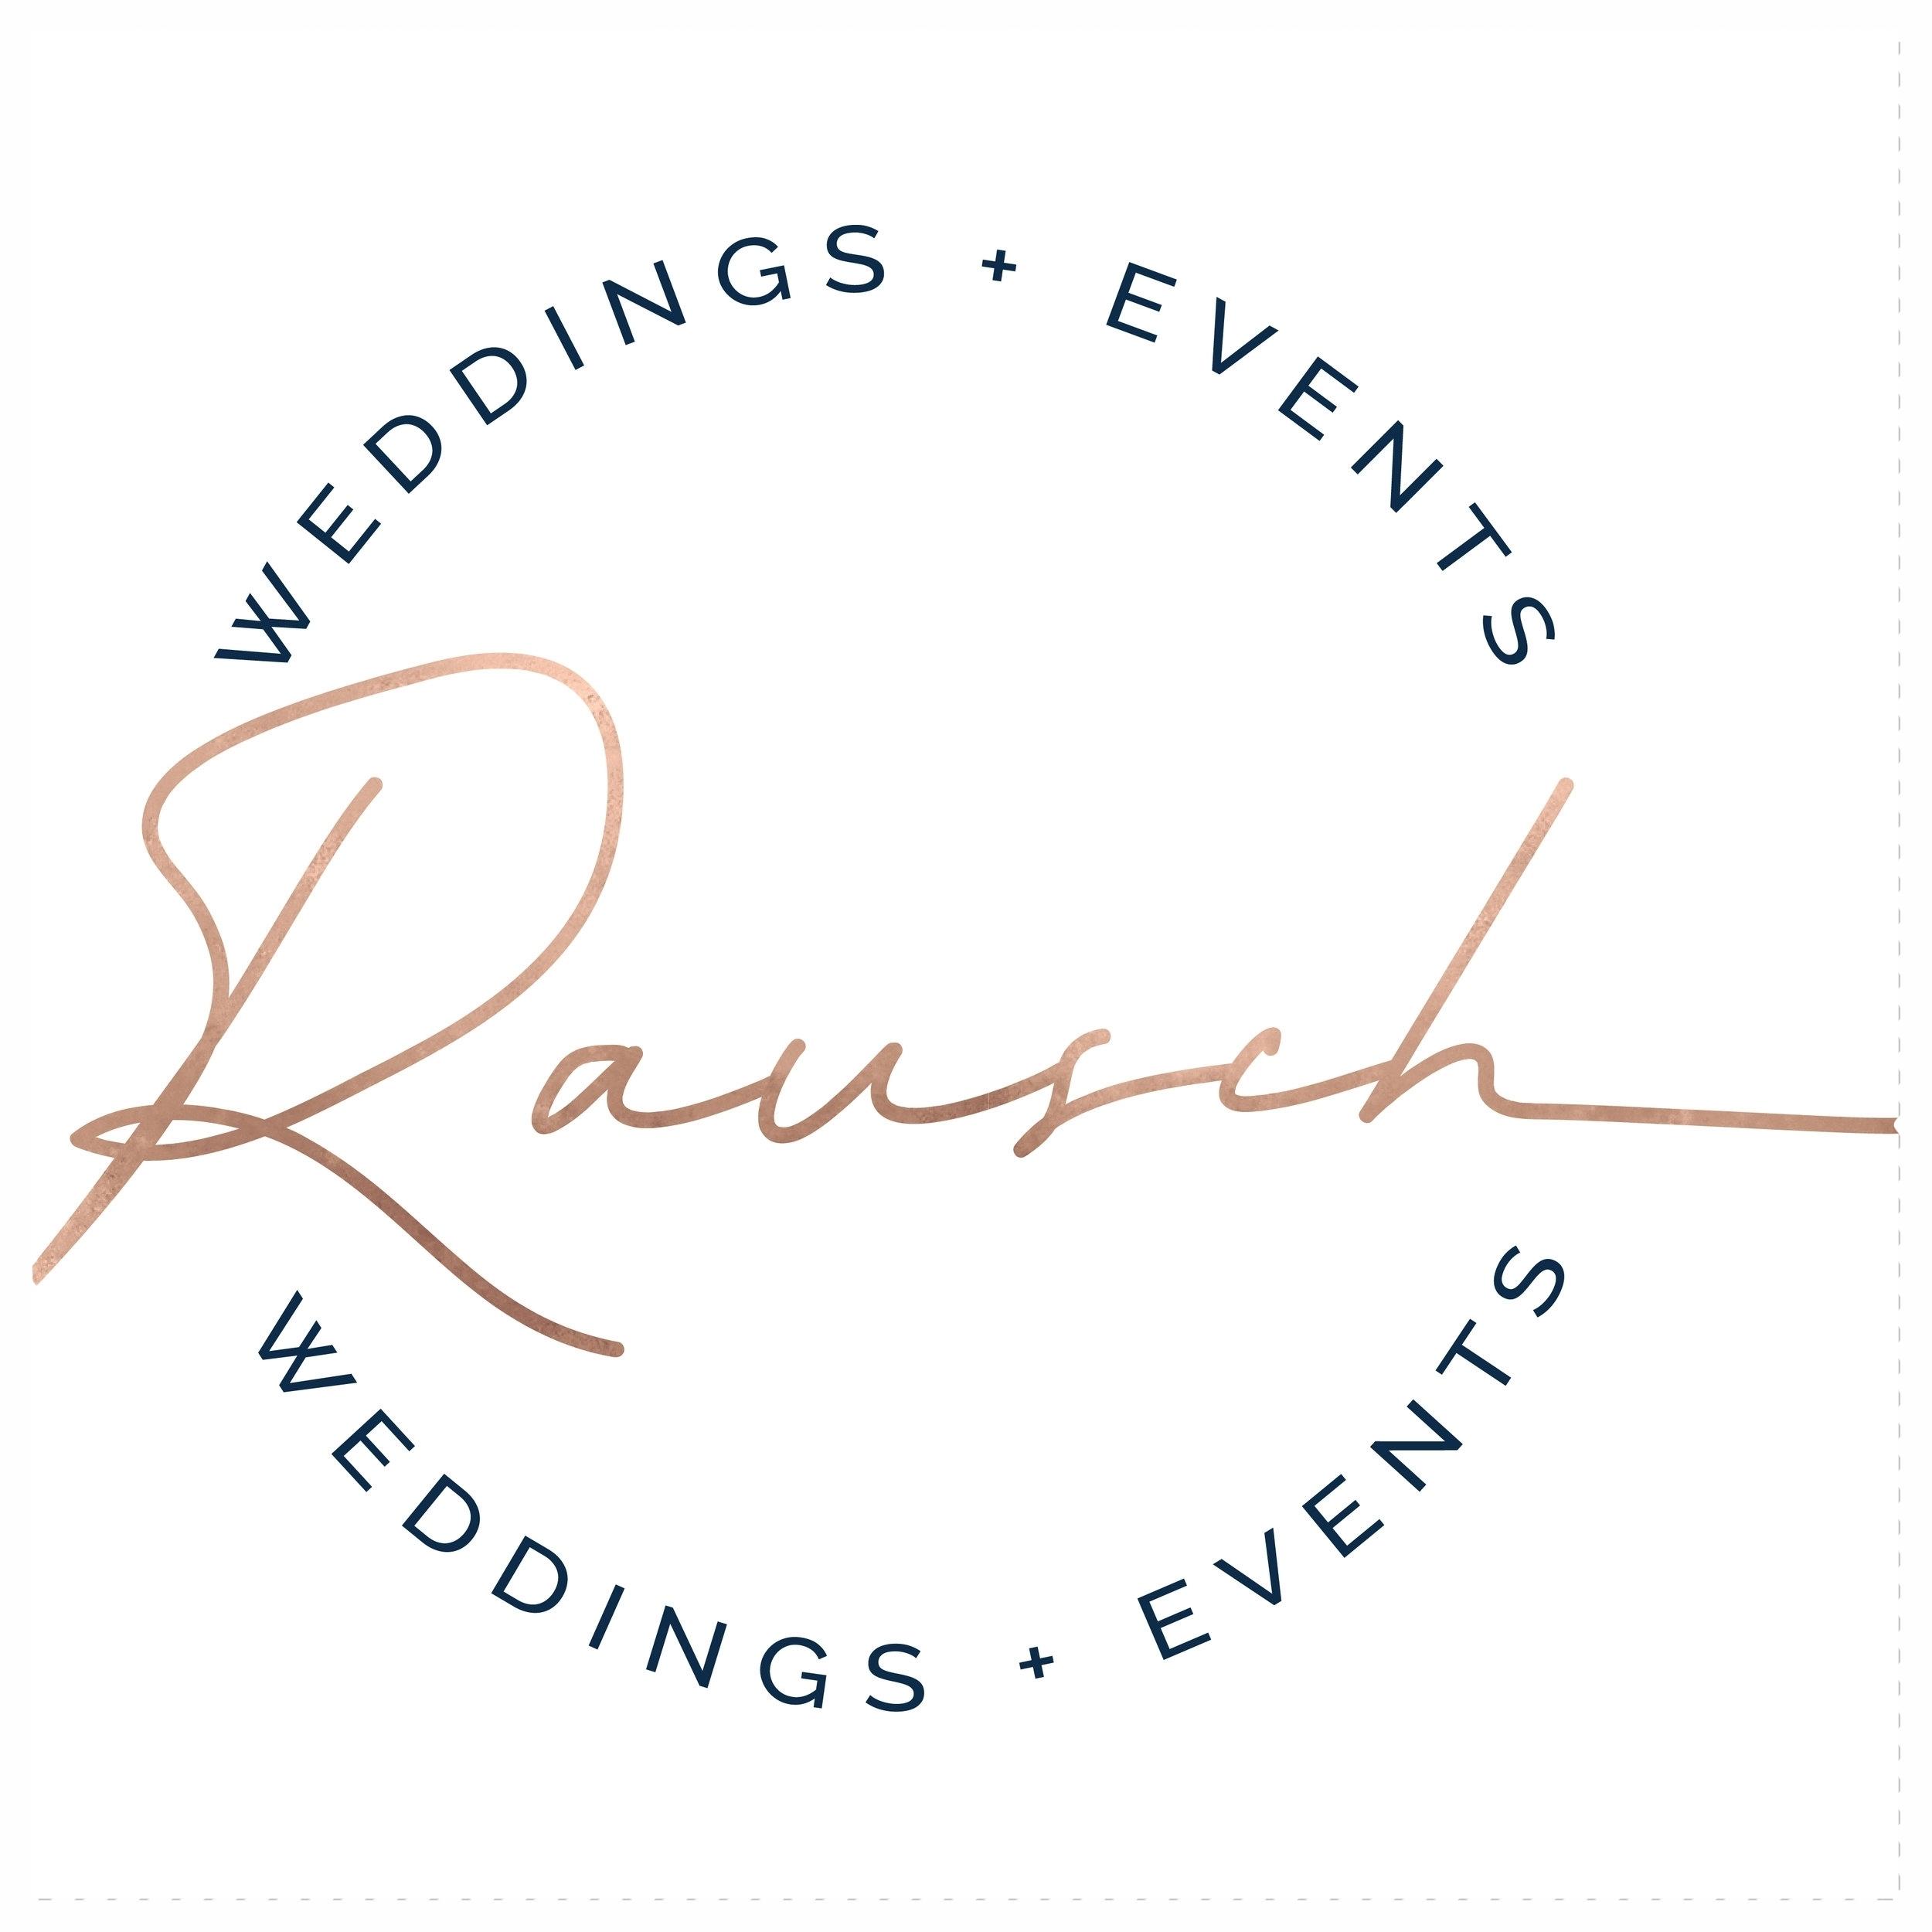 Rausch Weddings + Events_Submark 2.jpg